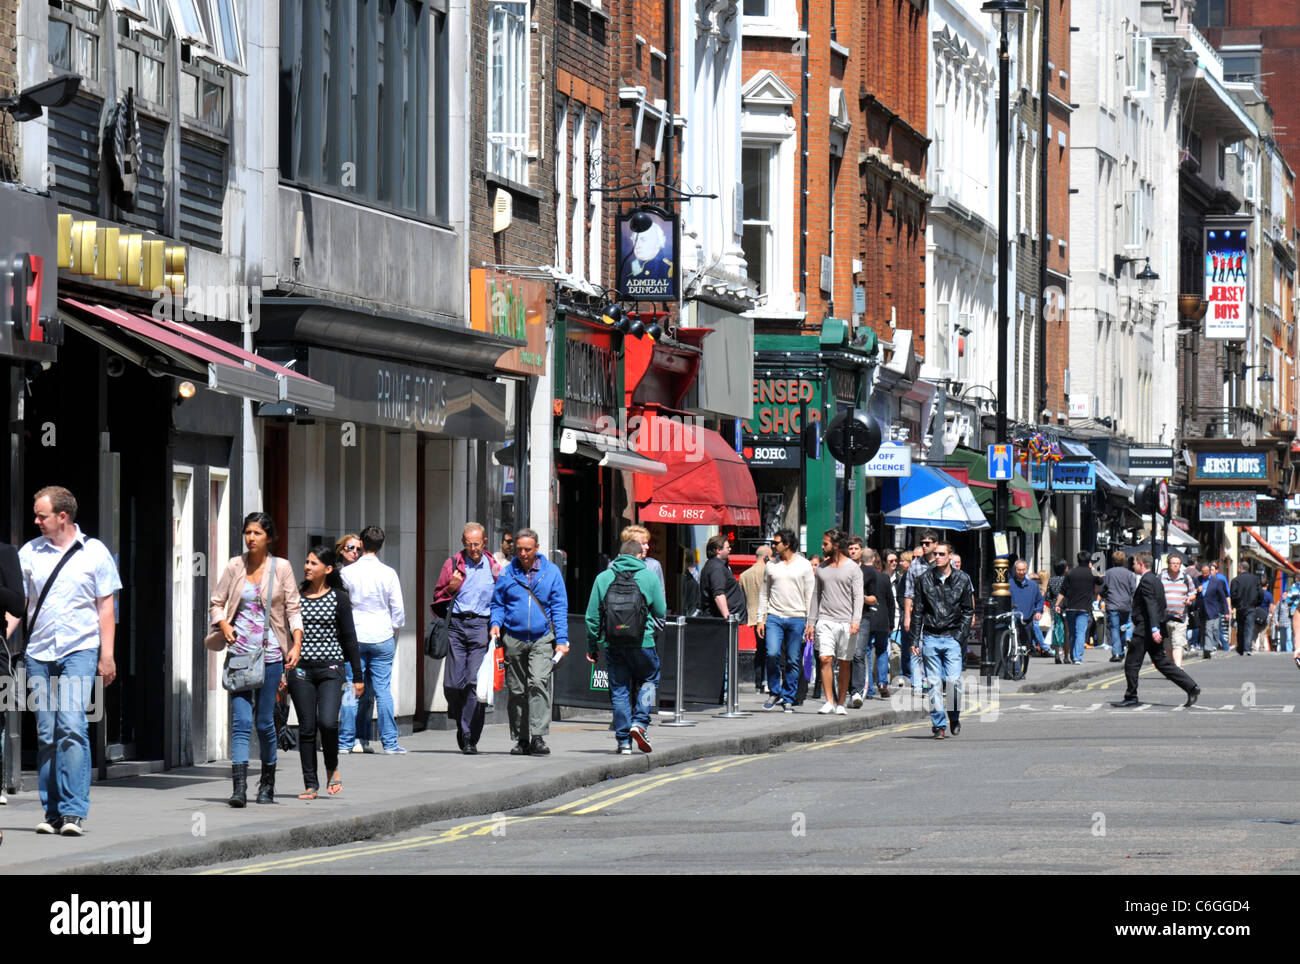 Old Compton Street, Soho, London, Britain, UK - Stock Image